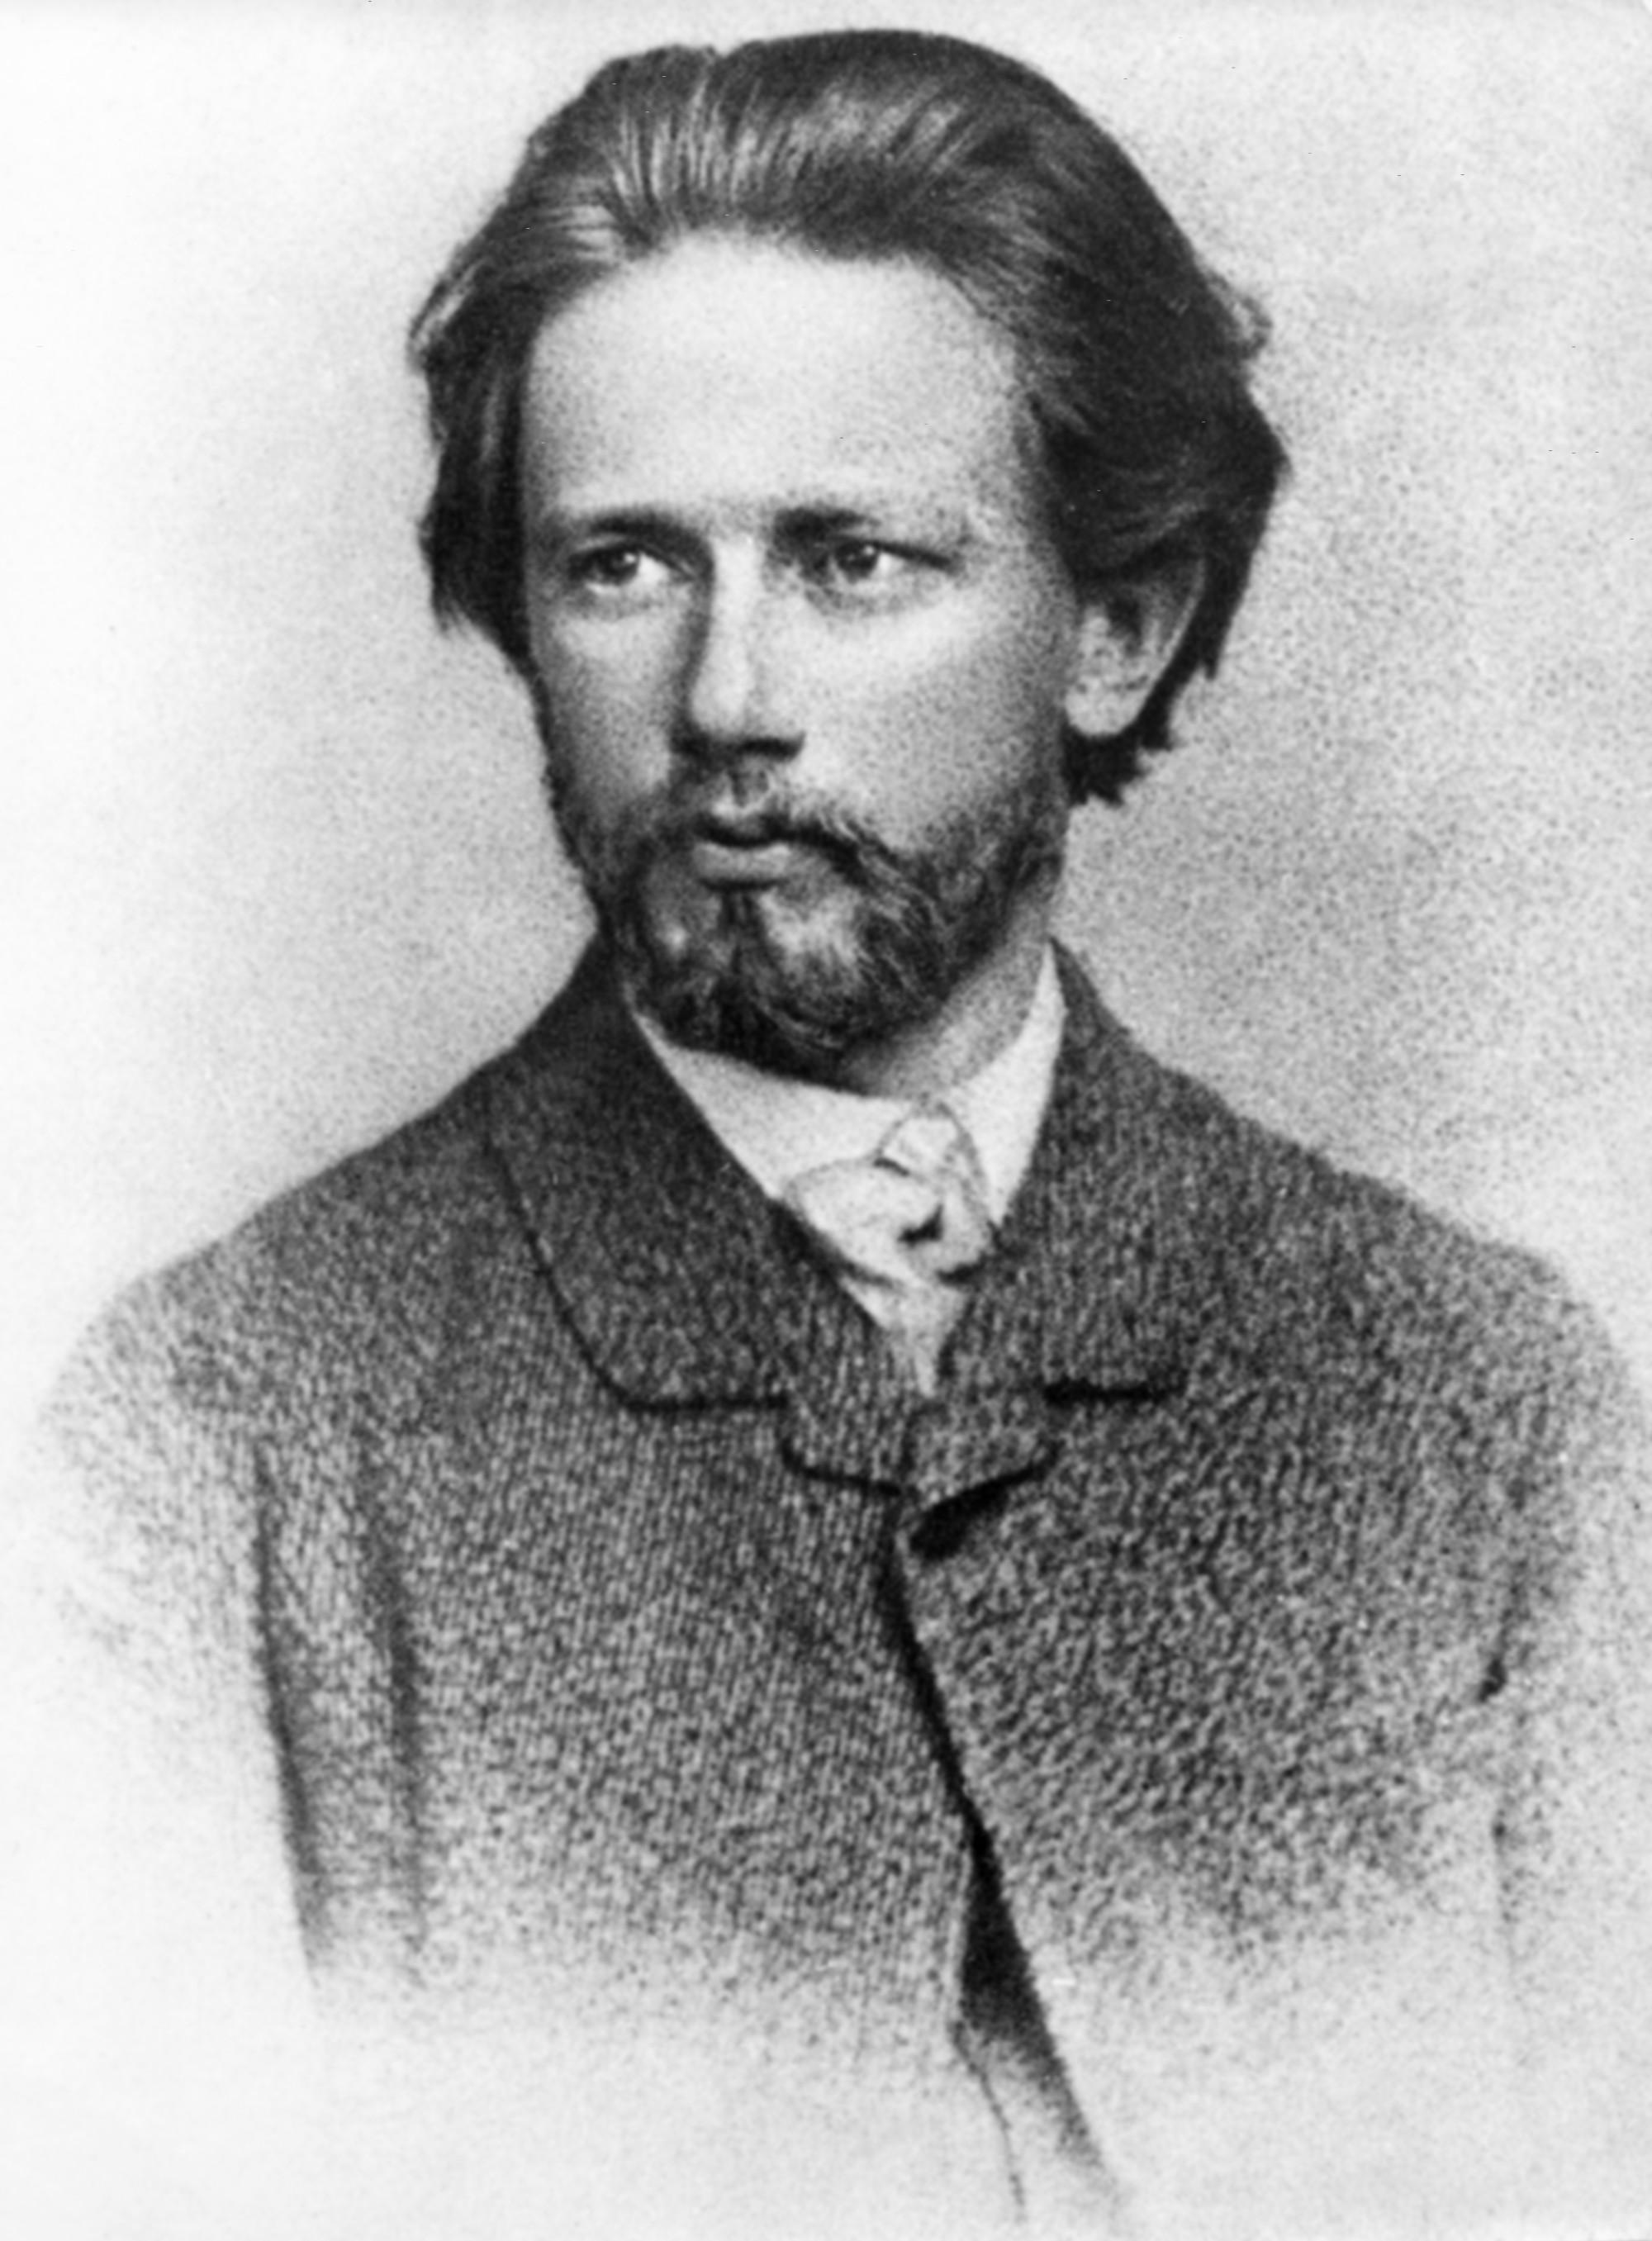 Pyotr Ilyich Tchaikovsky Tchaikovsky - Deems Taylor 1812 Festival Overture Op. 49 - Capriccio Italien - Wellington's Victory